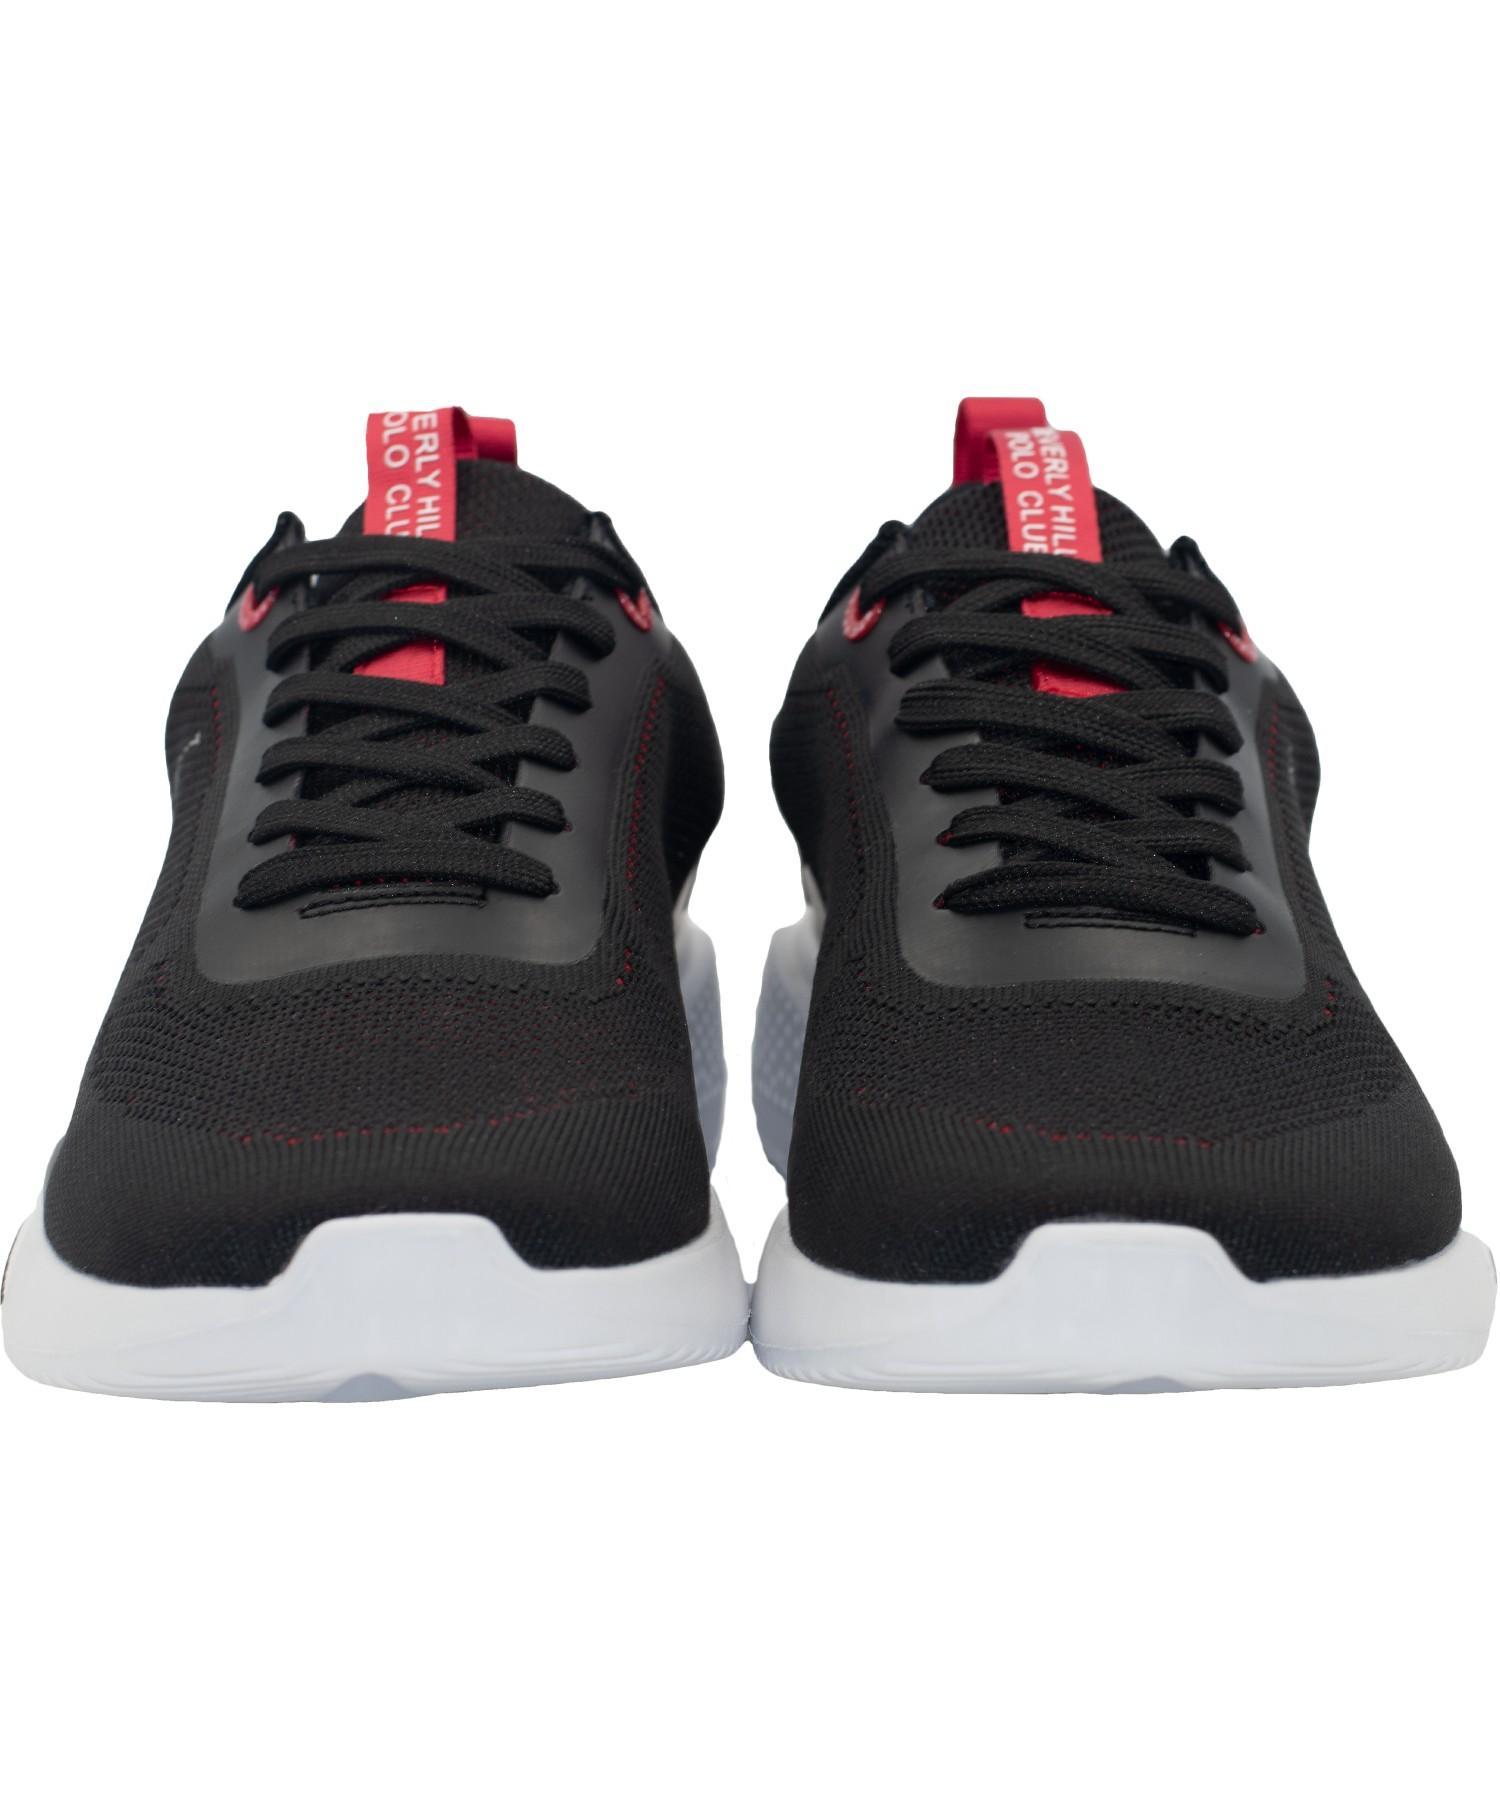 Zapatillas de Hombre Bhpc Lift Negro-Blanco